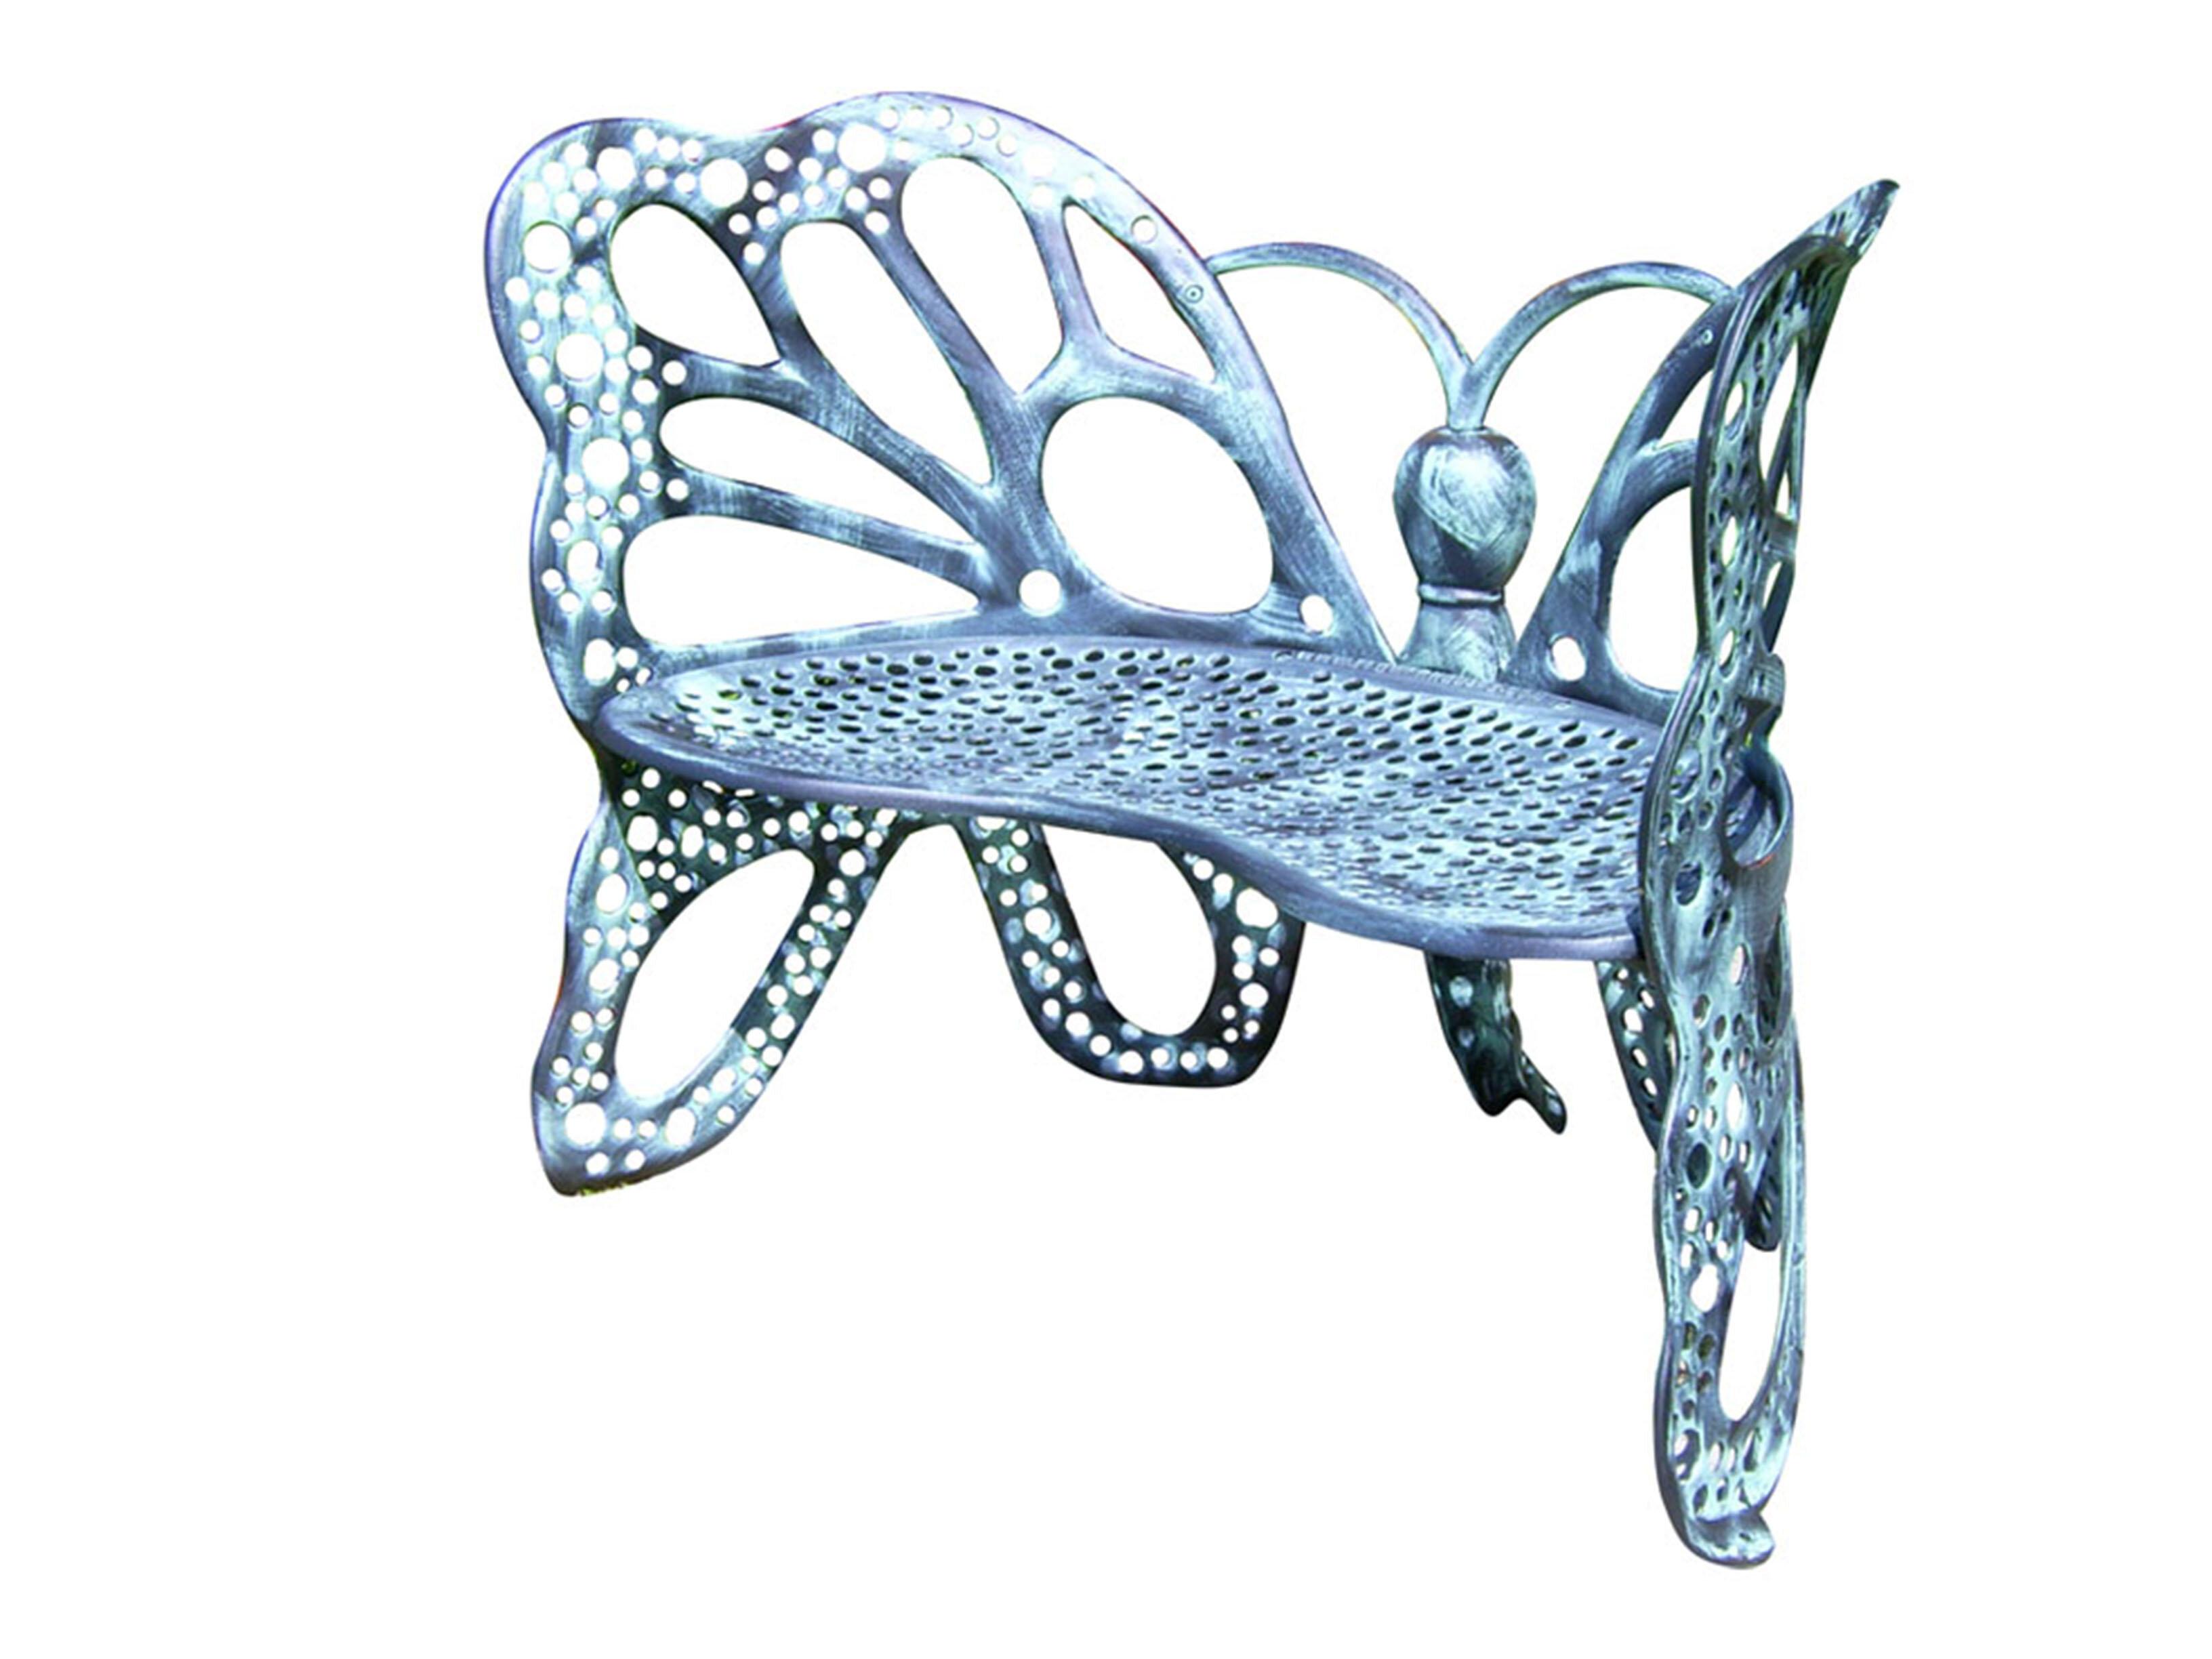 Luxury Plastic Transfer Bench Motif - Bathtub Ideas - dilata.info